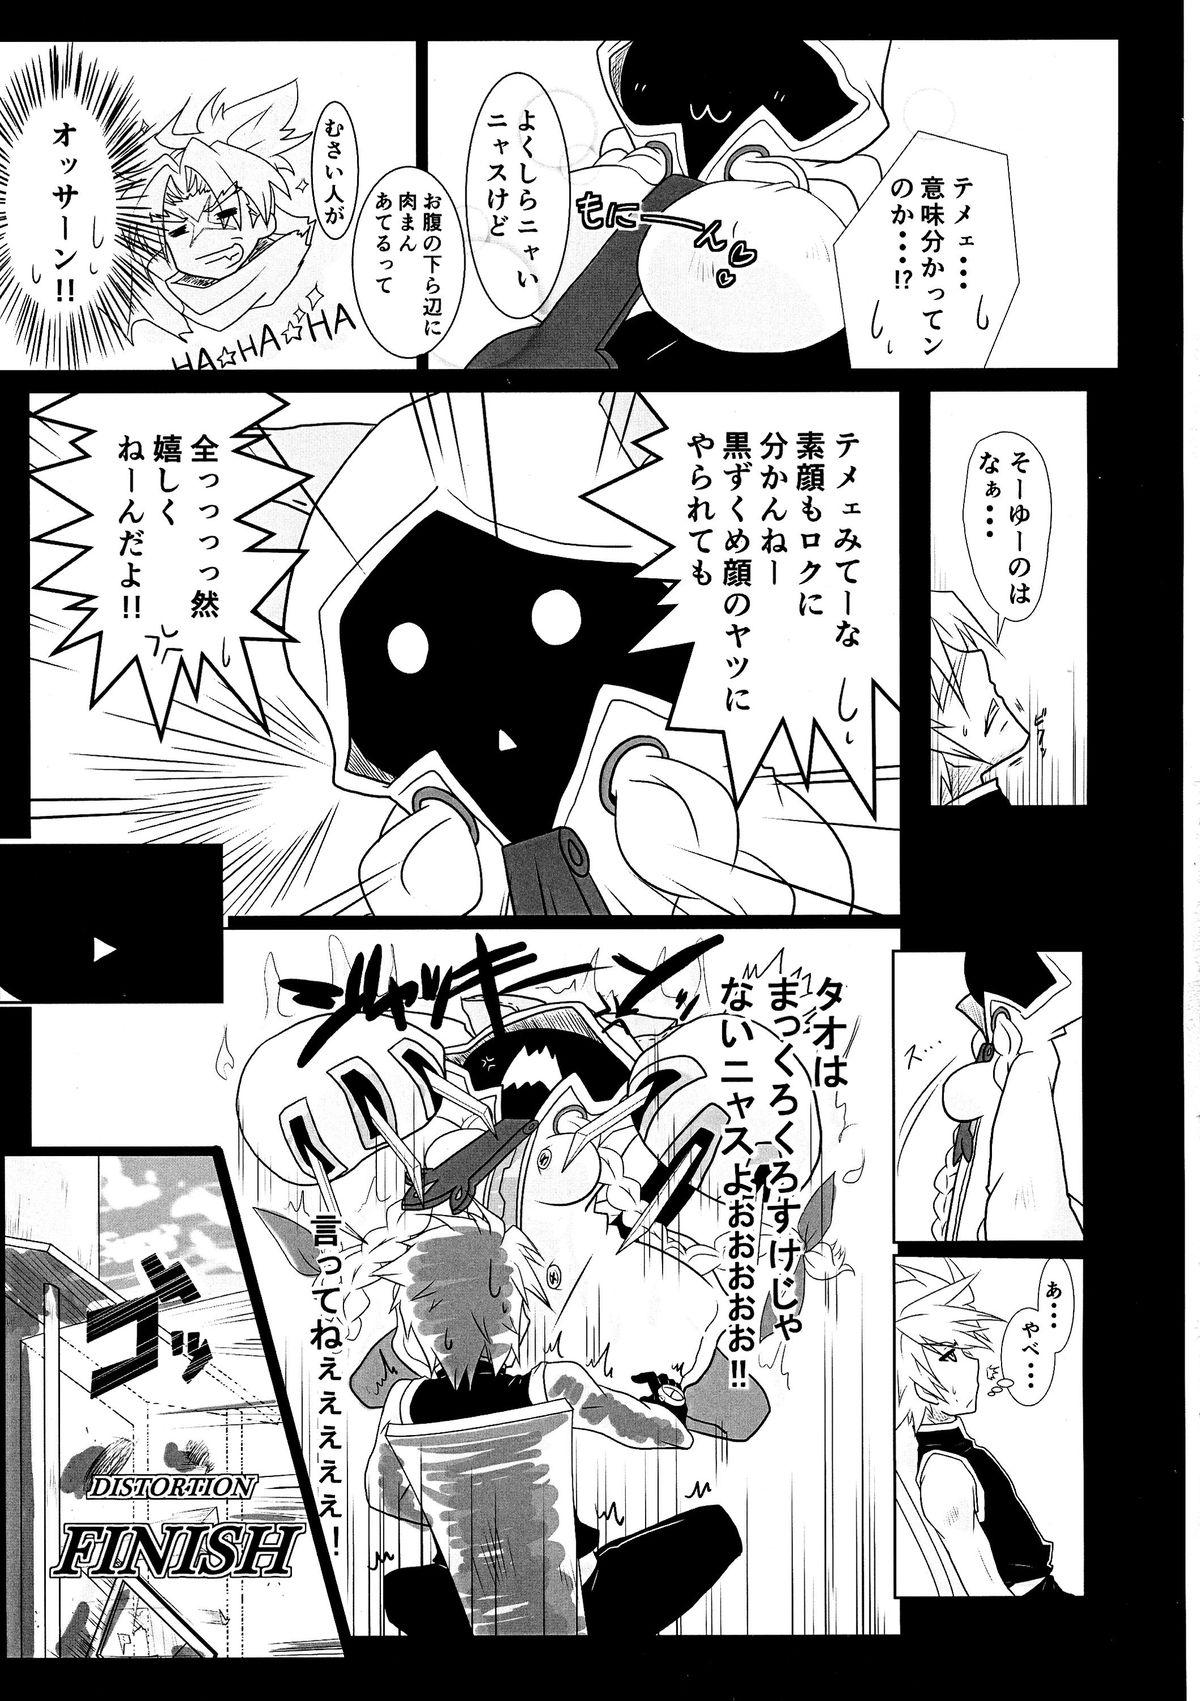 Tao no Ongaeshi 6